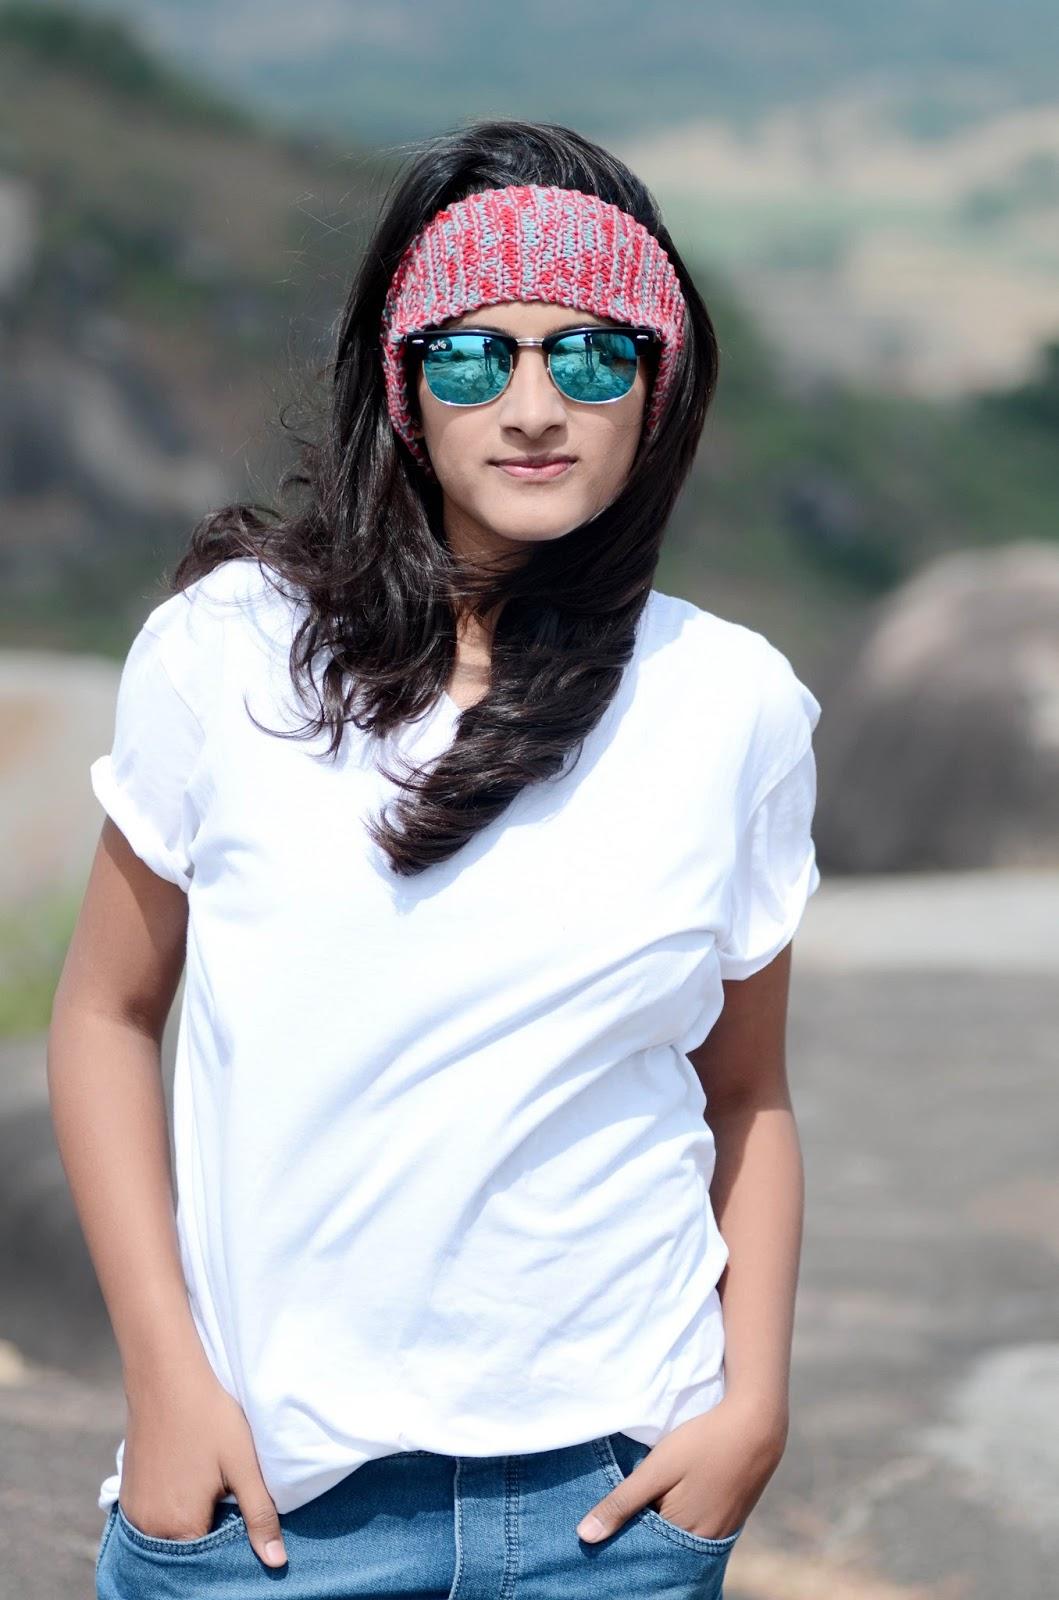 how to style a white tshirt, different styles of tshirt, white tshirt with the skirt, white shirt with blue denim, stylish denim,girl wearing a bandana